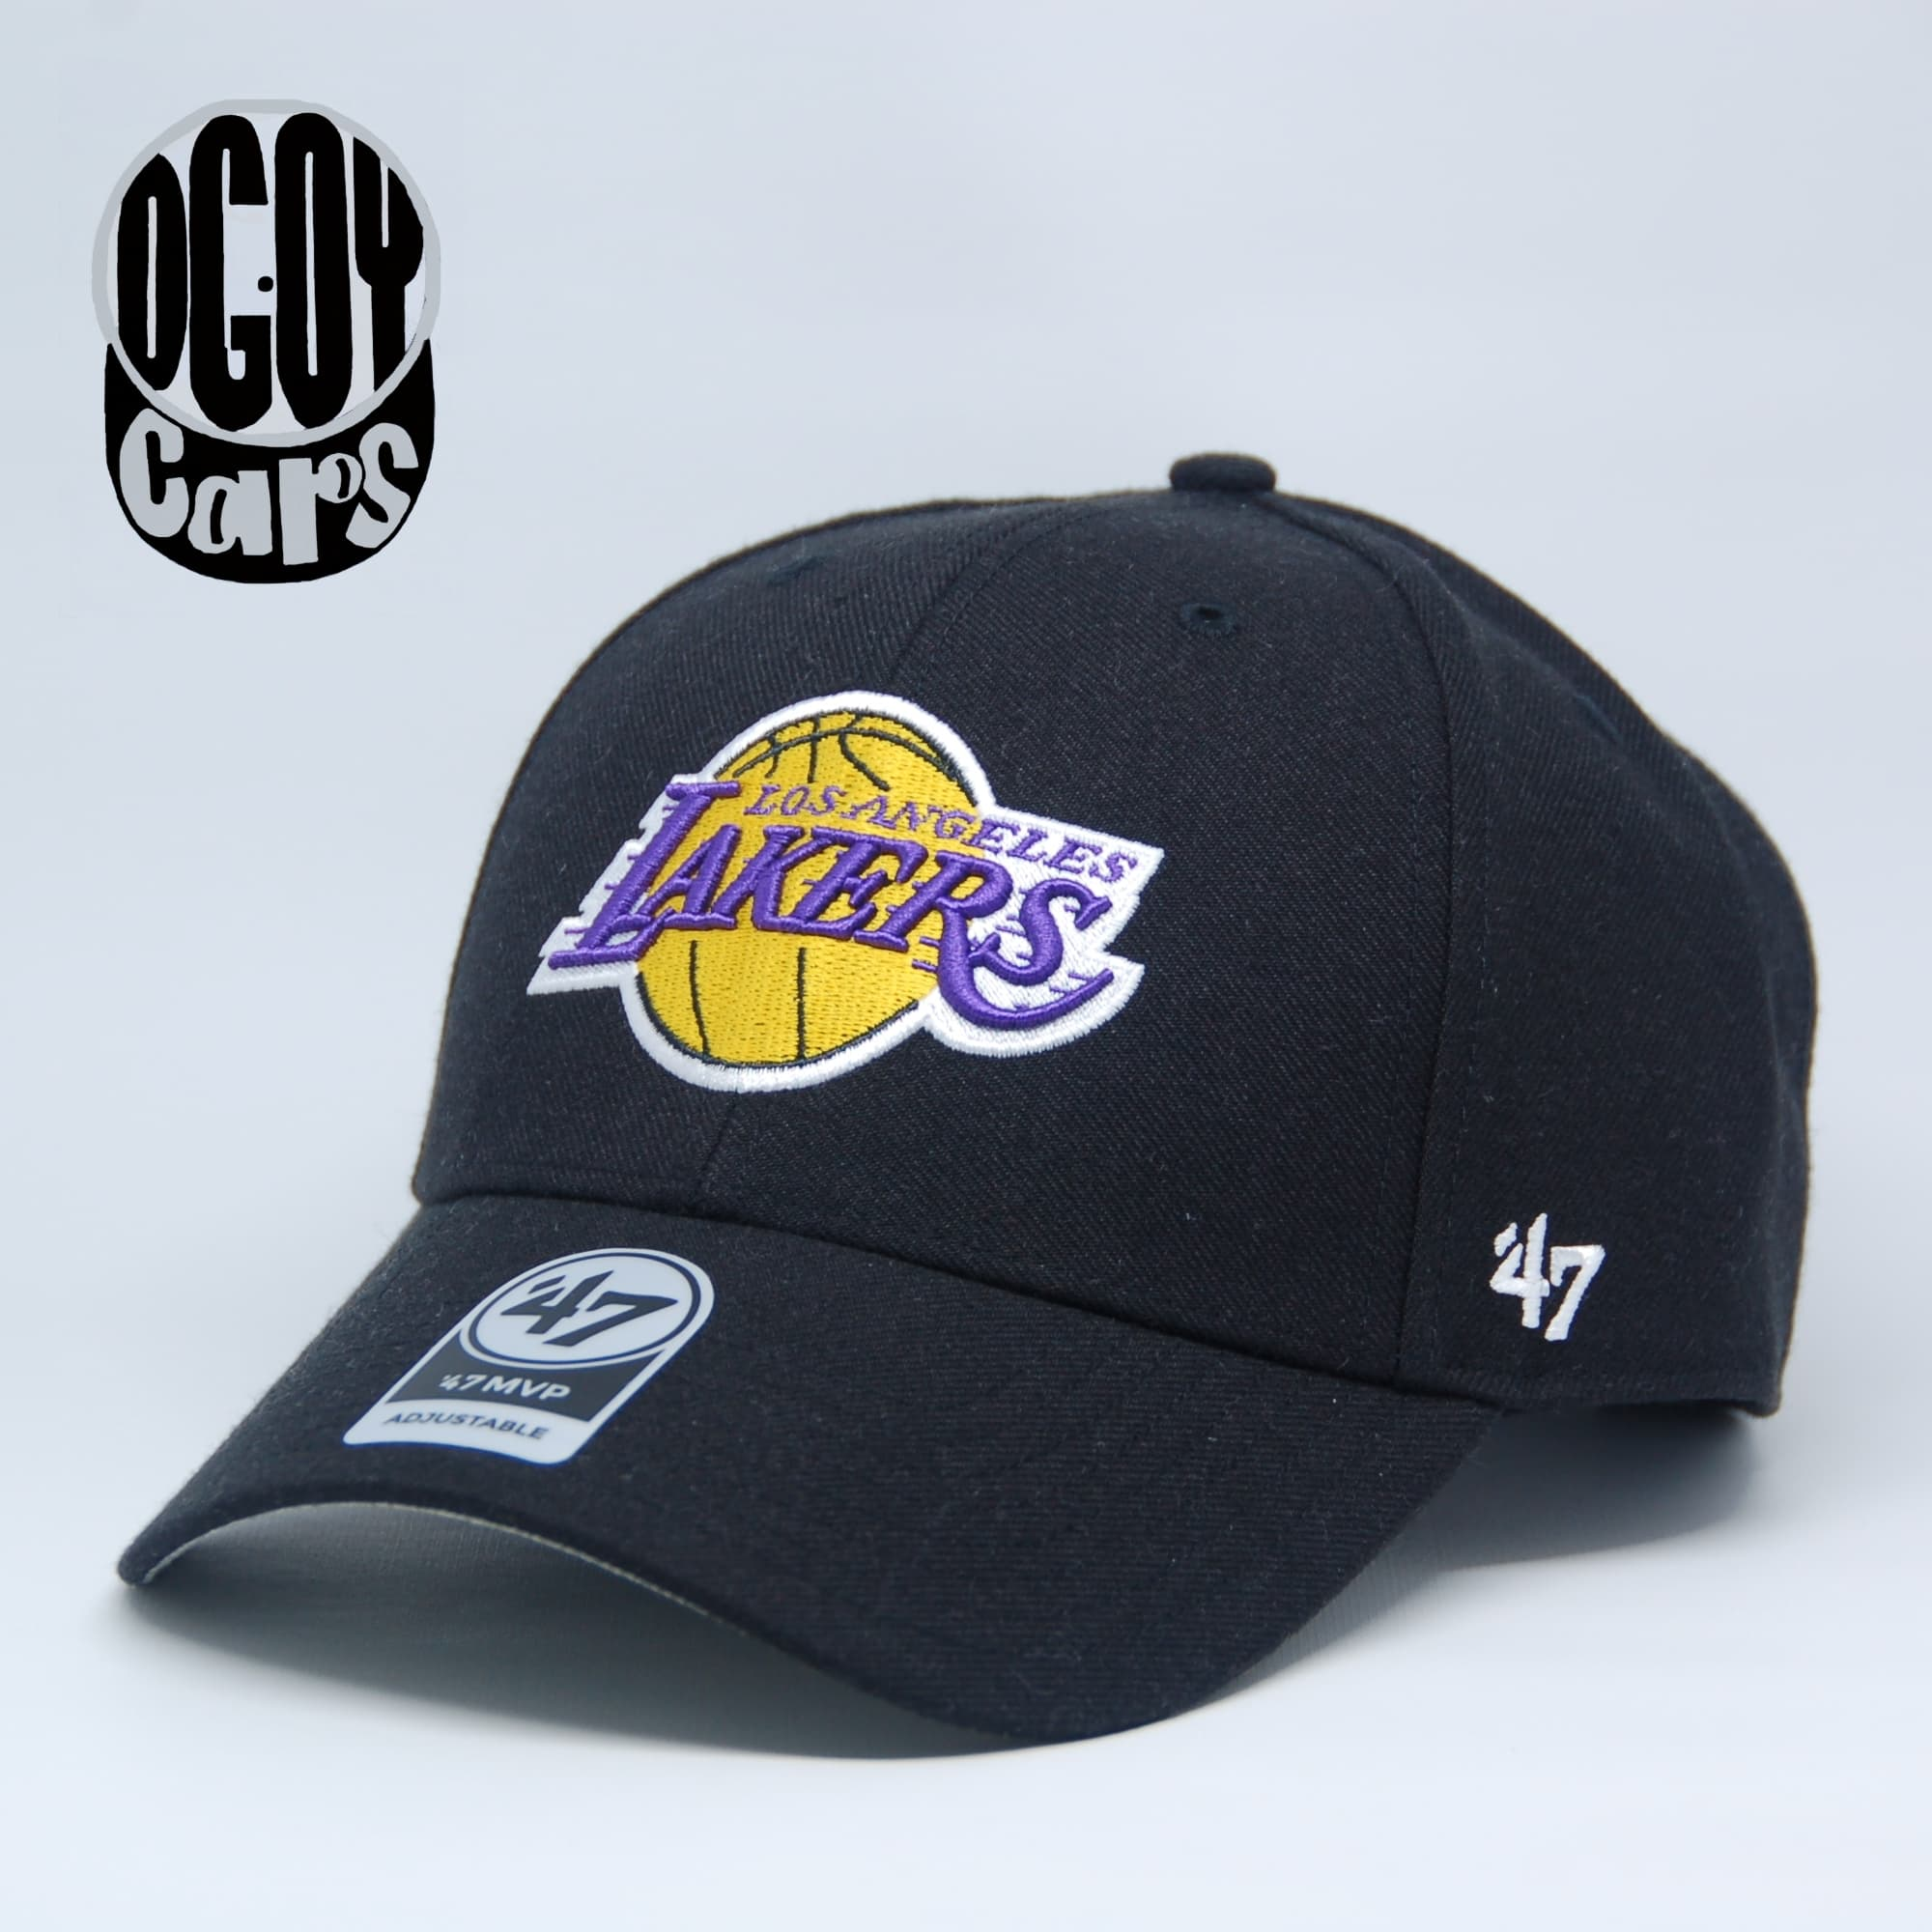 Jual Authentic Los Angeles Lakers '47 brand MVP Curve cap